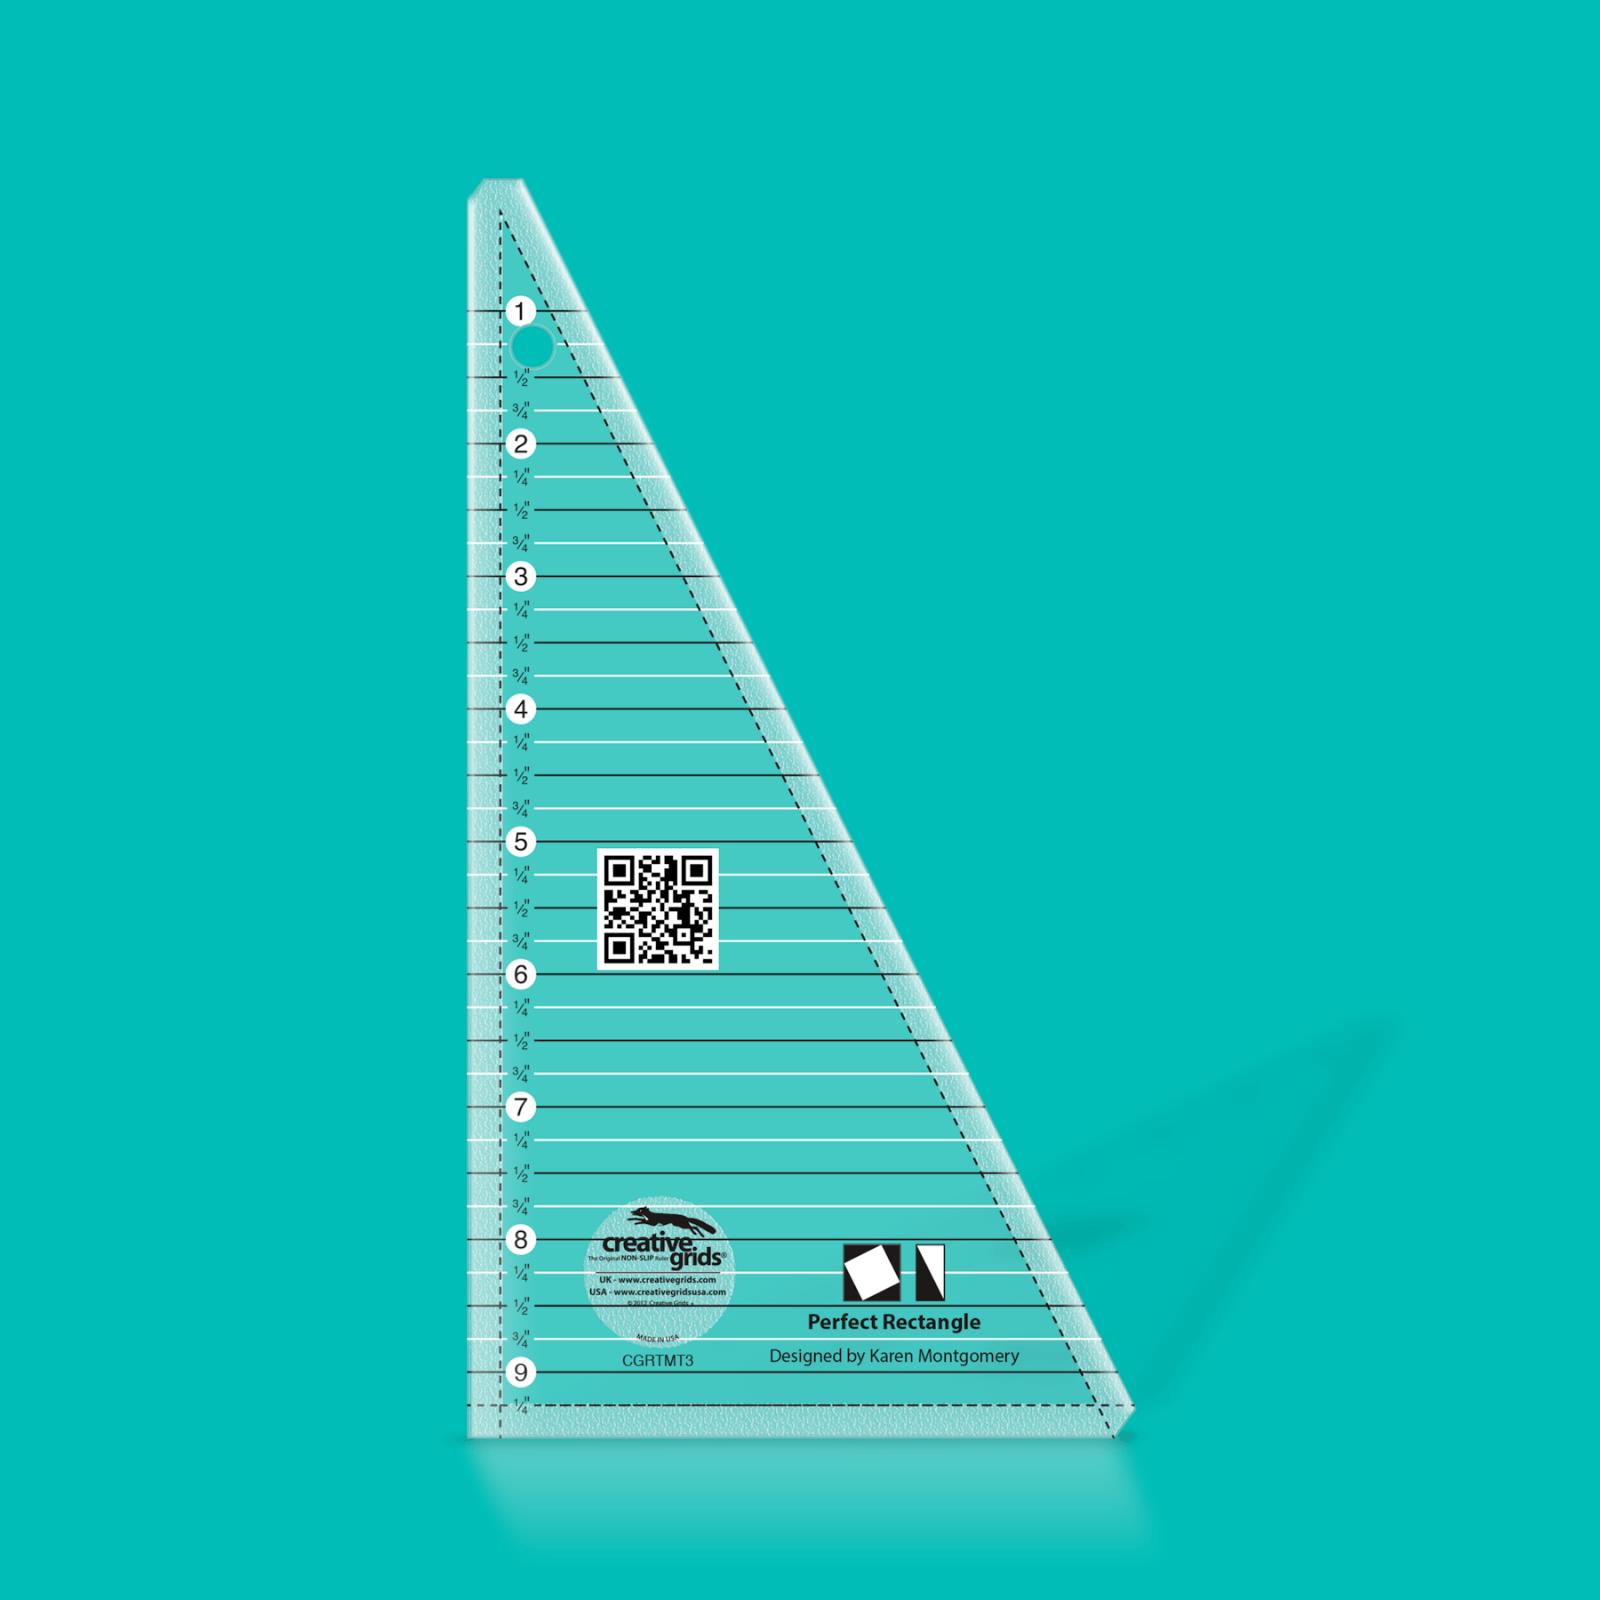 Creative Grids 9.5 Perfect Rectangle Ruler | SKU# CGRTMT3